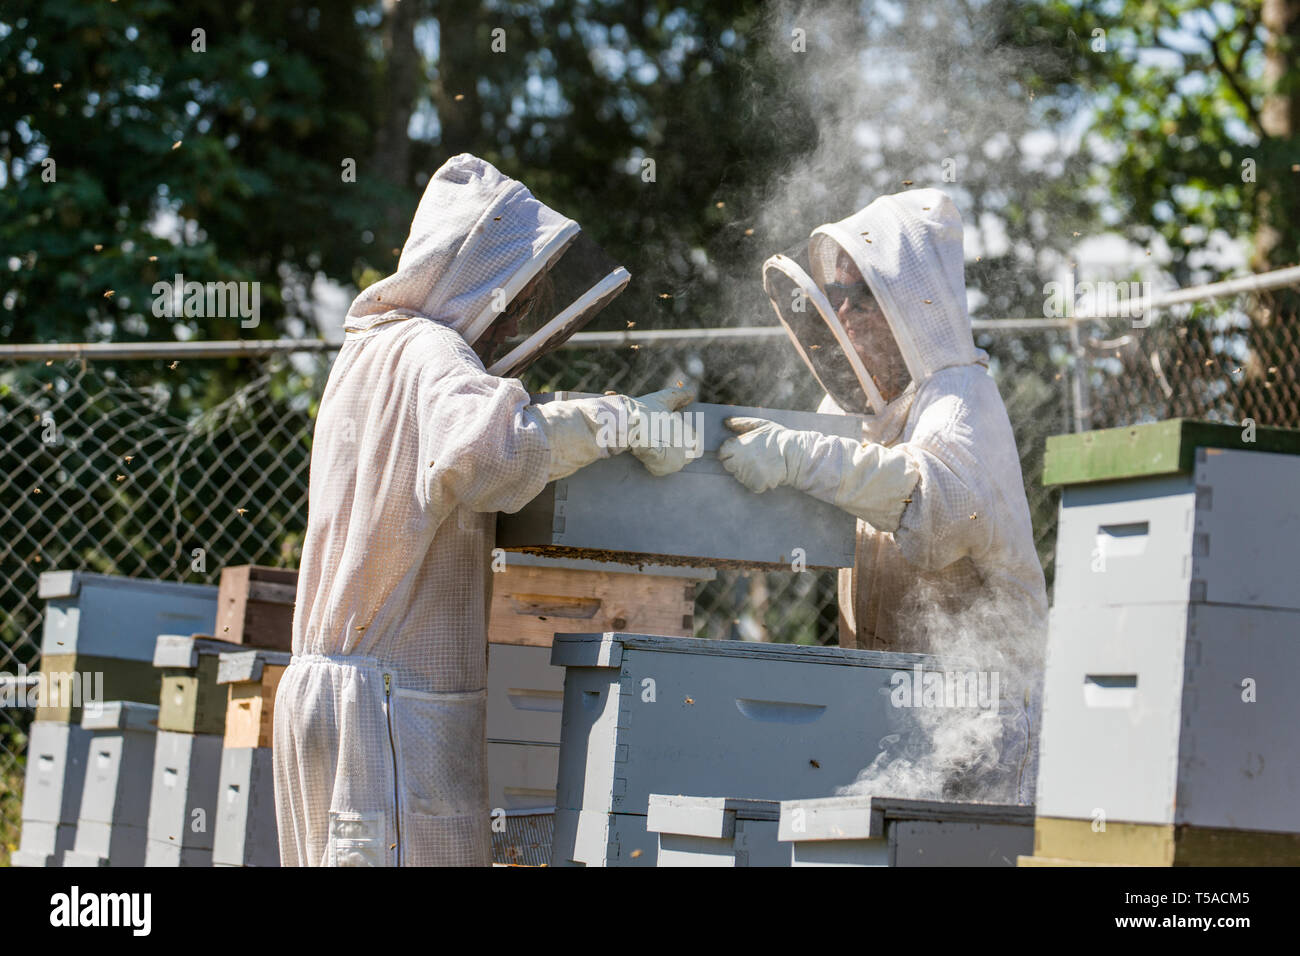 Langstroth Beehive Stock Photos & Langstroth Beehive Stock